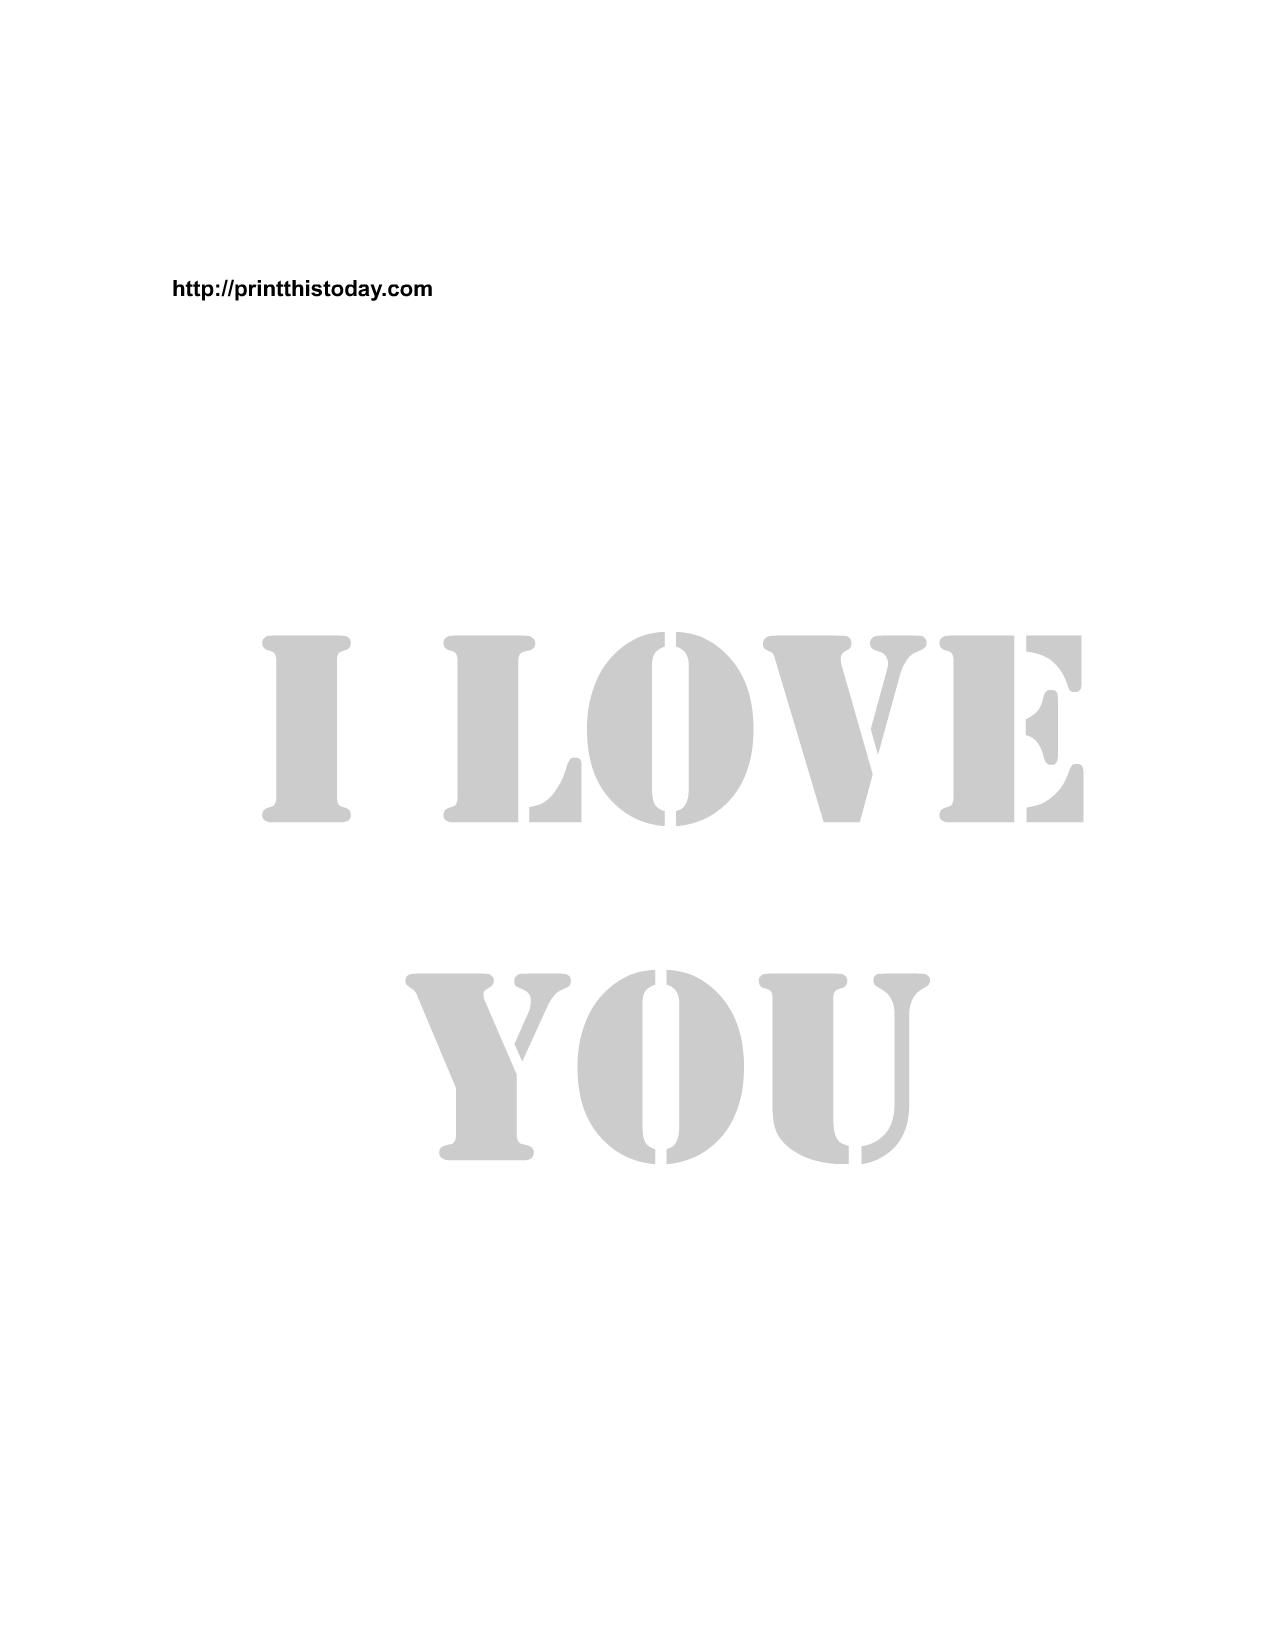 Free Printable Love Stencils